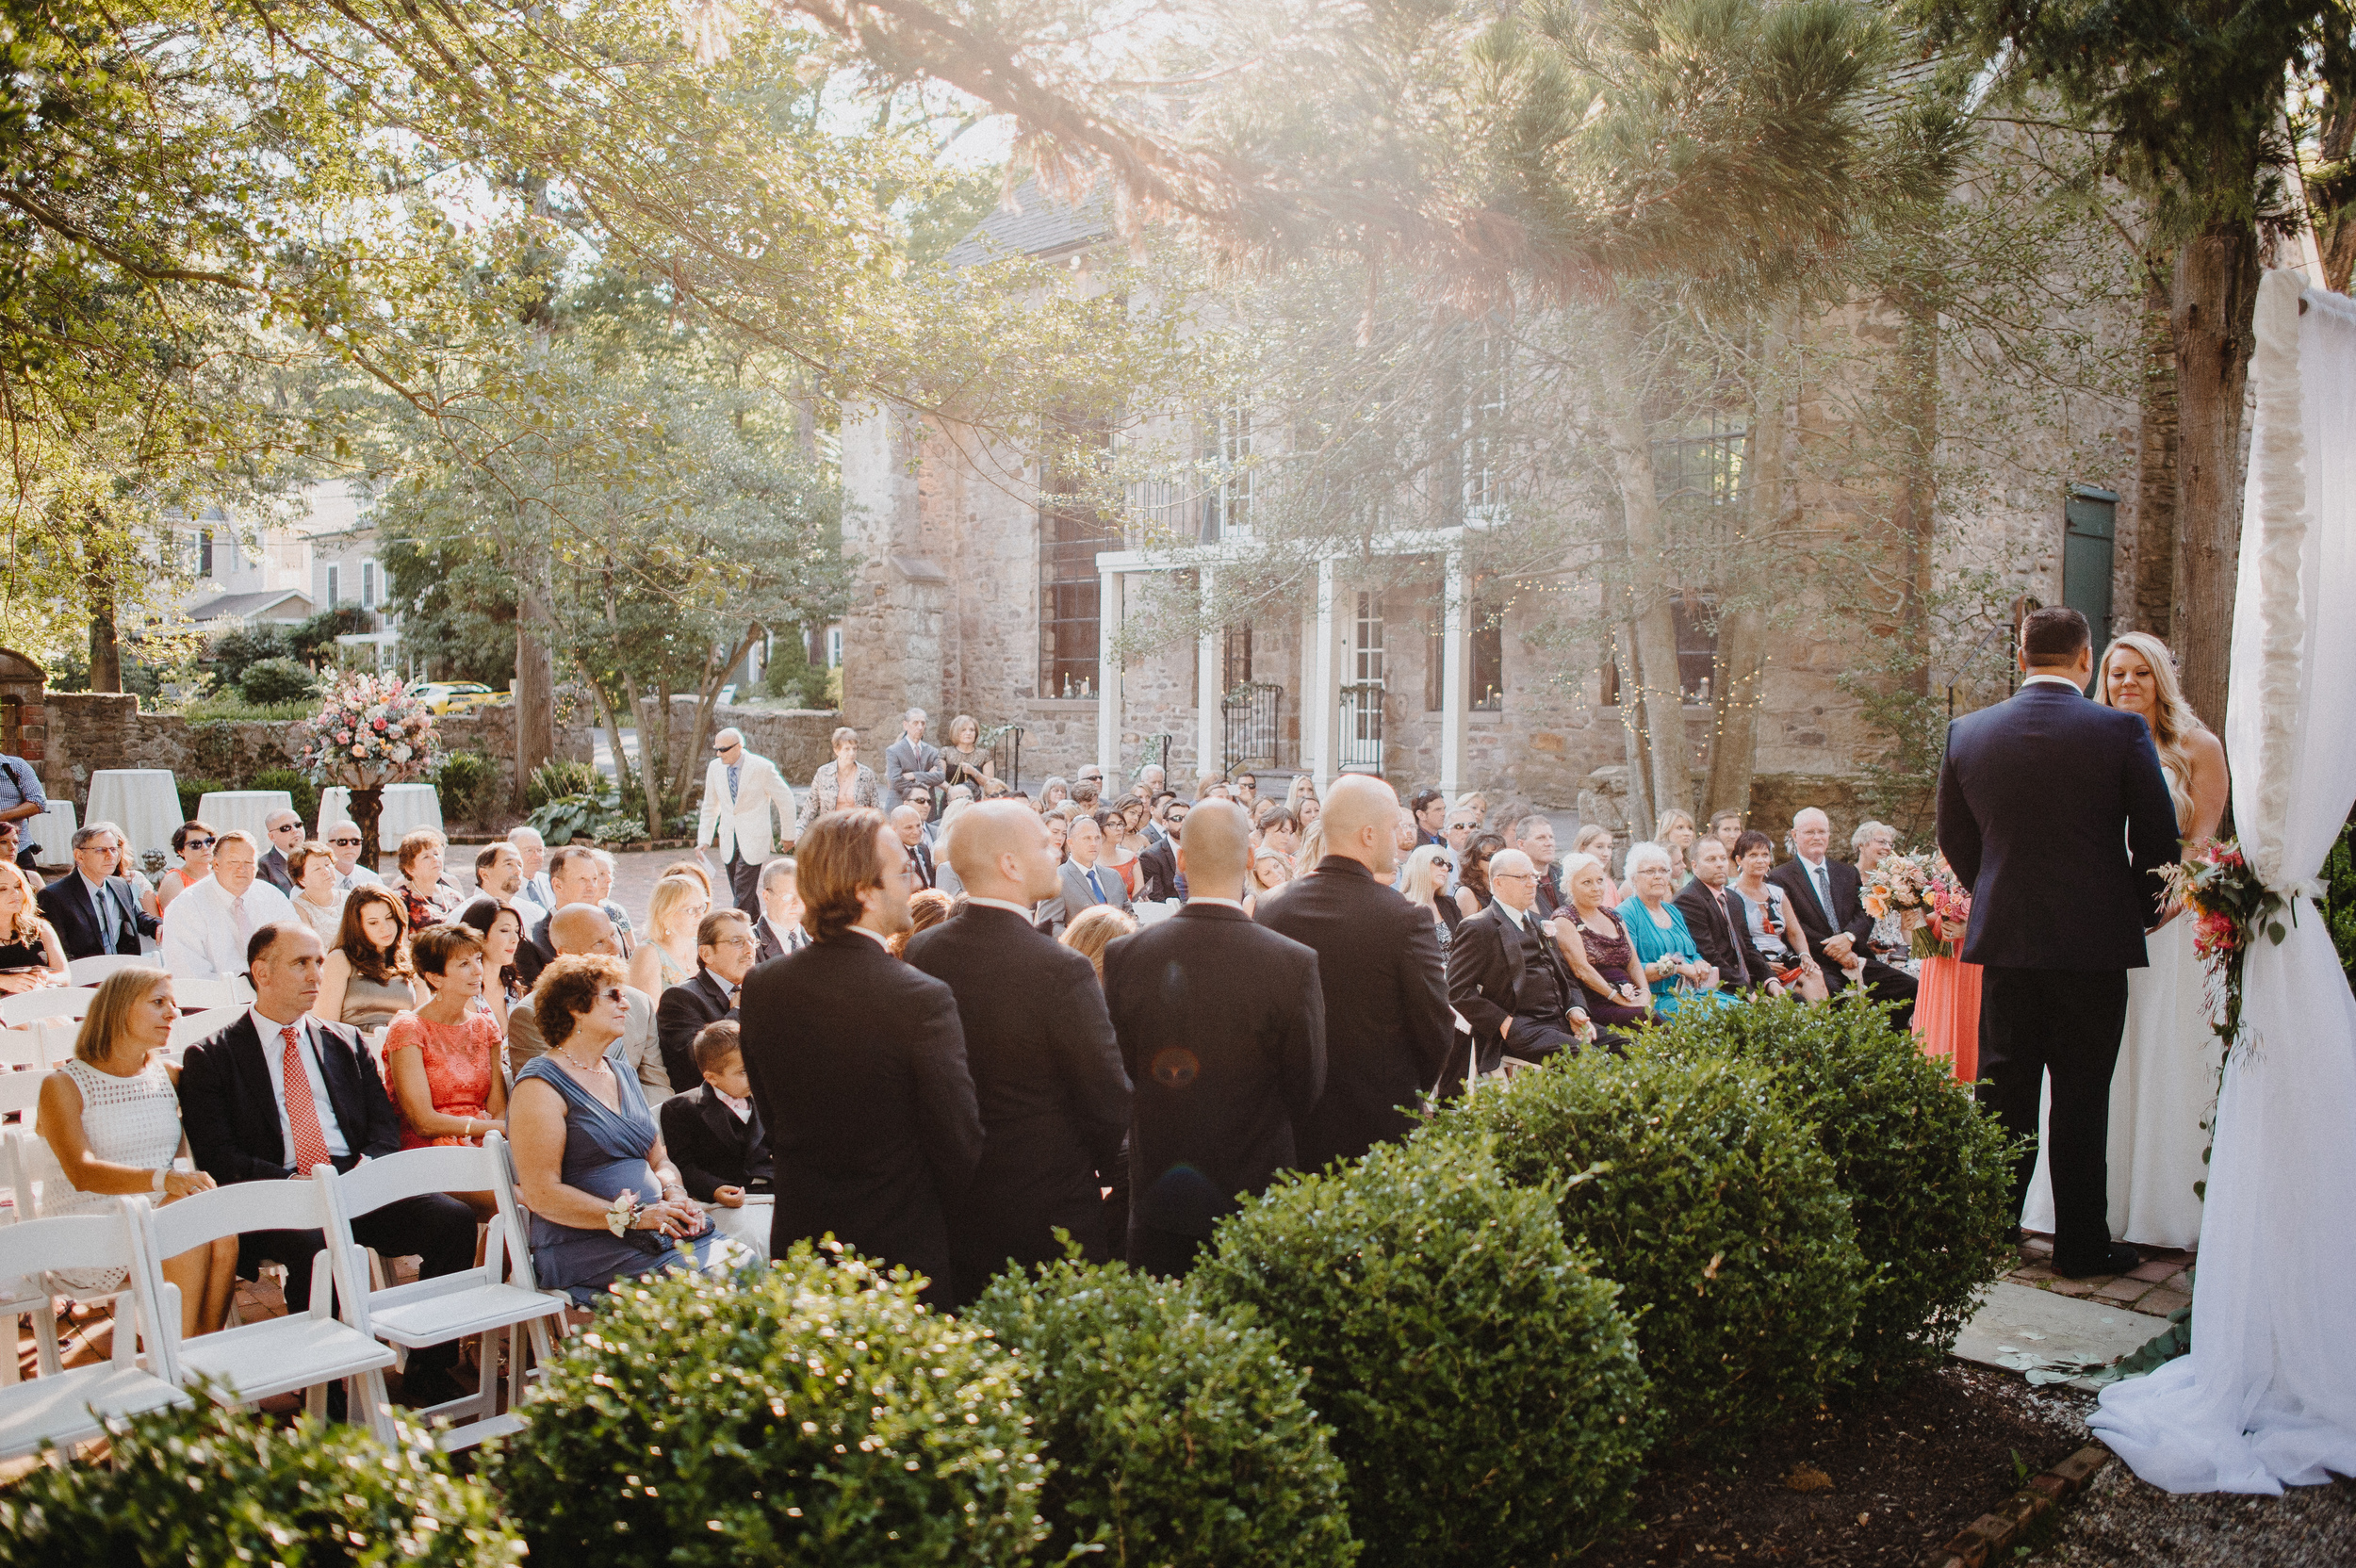 holly-hedge-estate-wedding-photographer-pat-robinson-photography-60.jpg